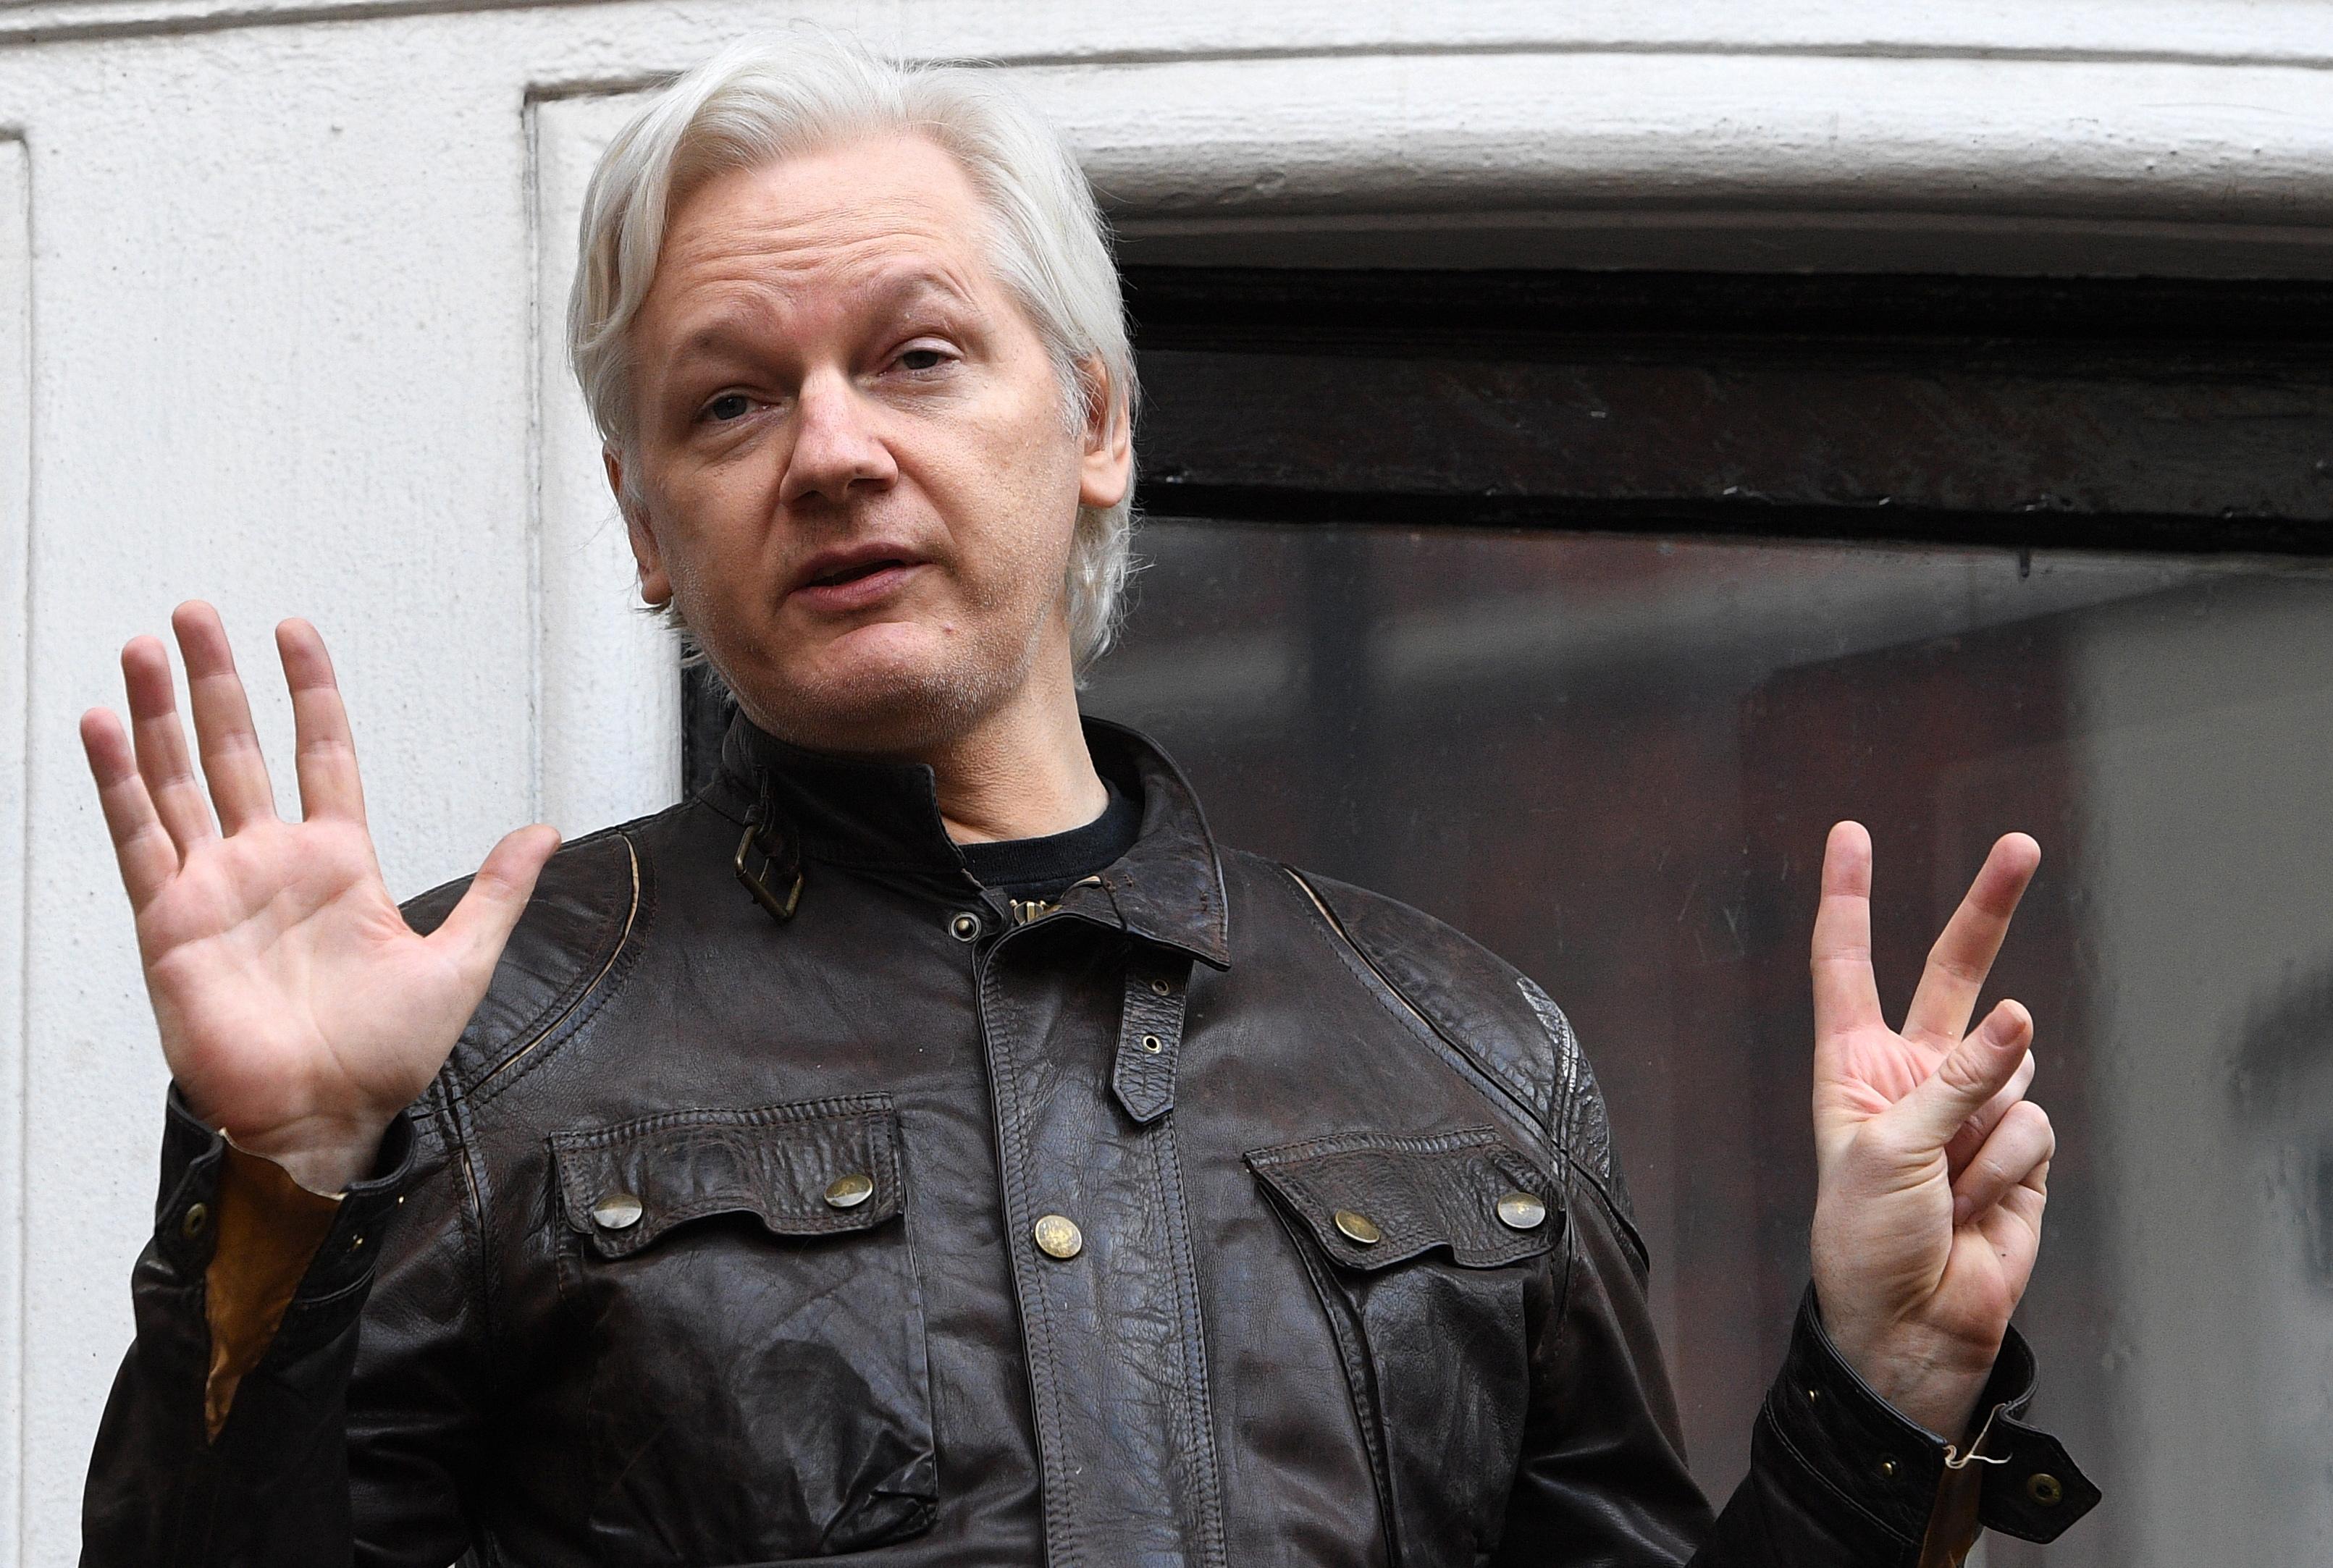 Julian Assange: World's most-wanted whistleblower